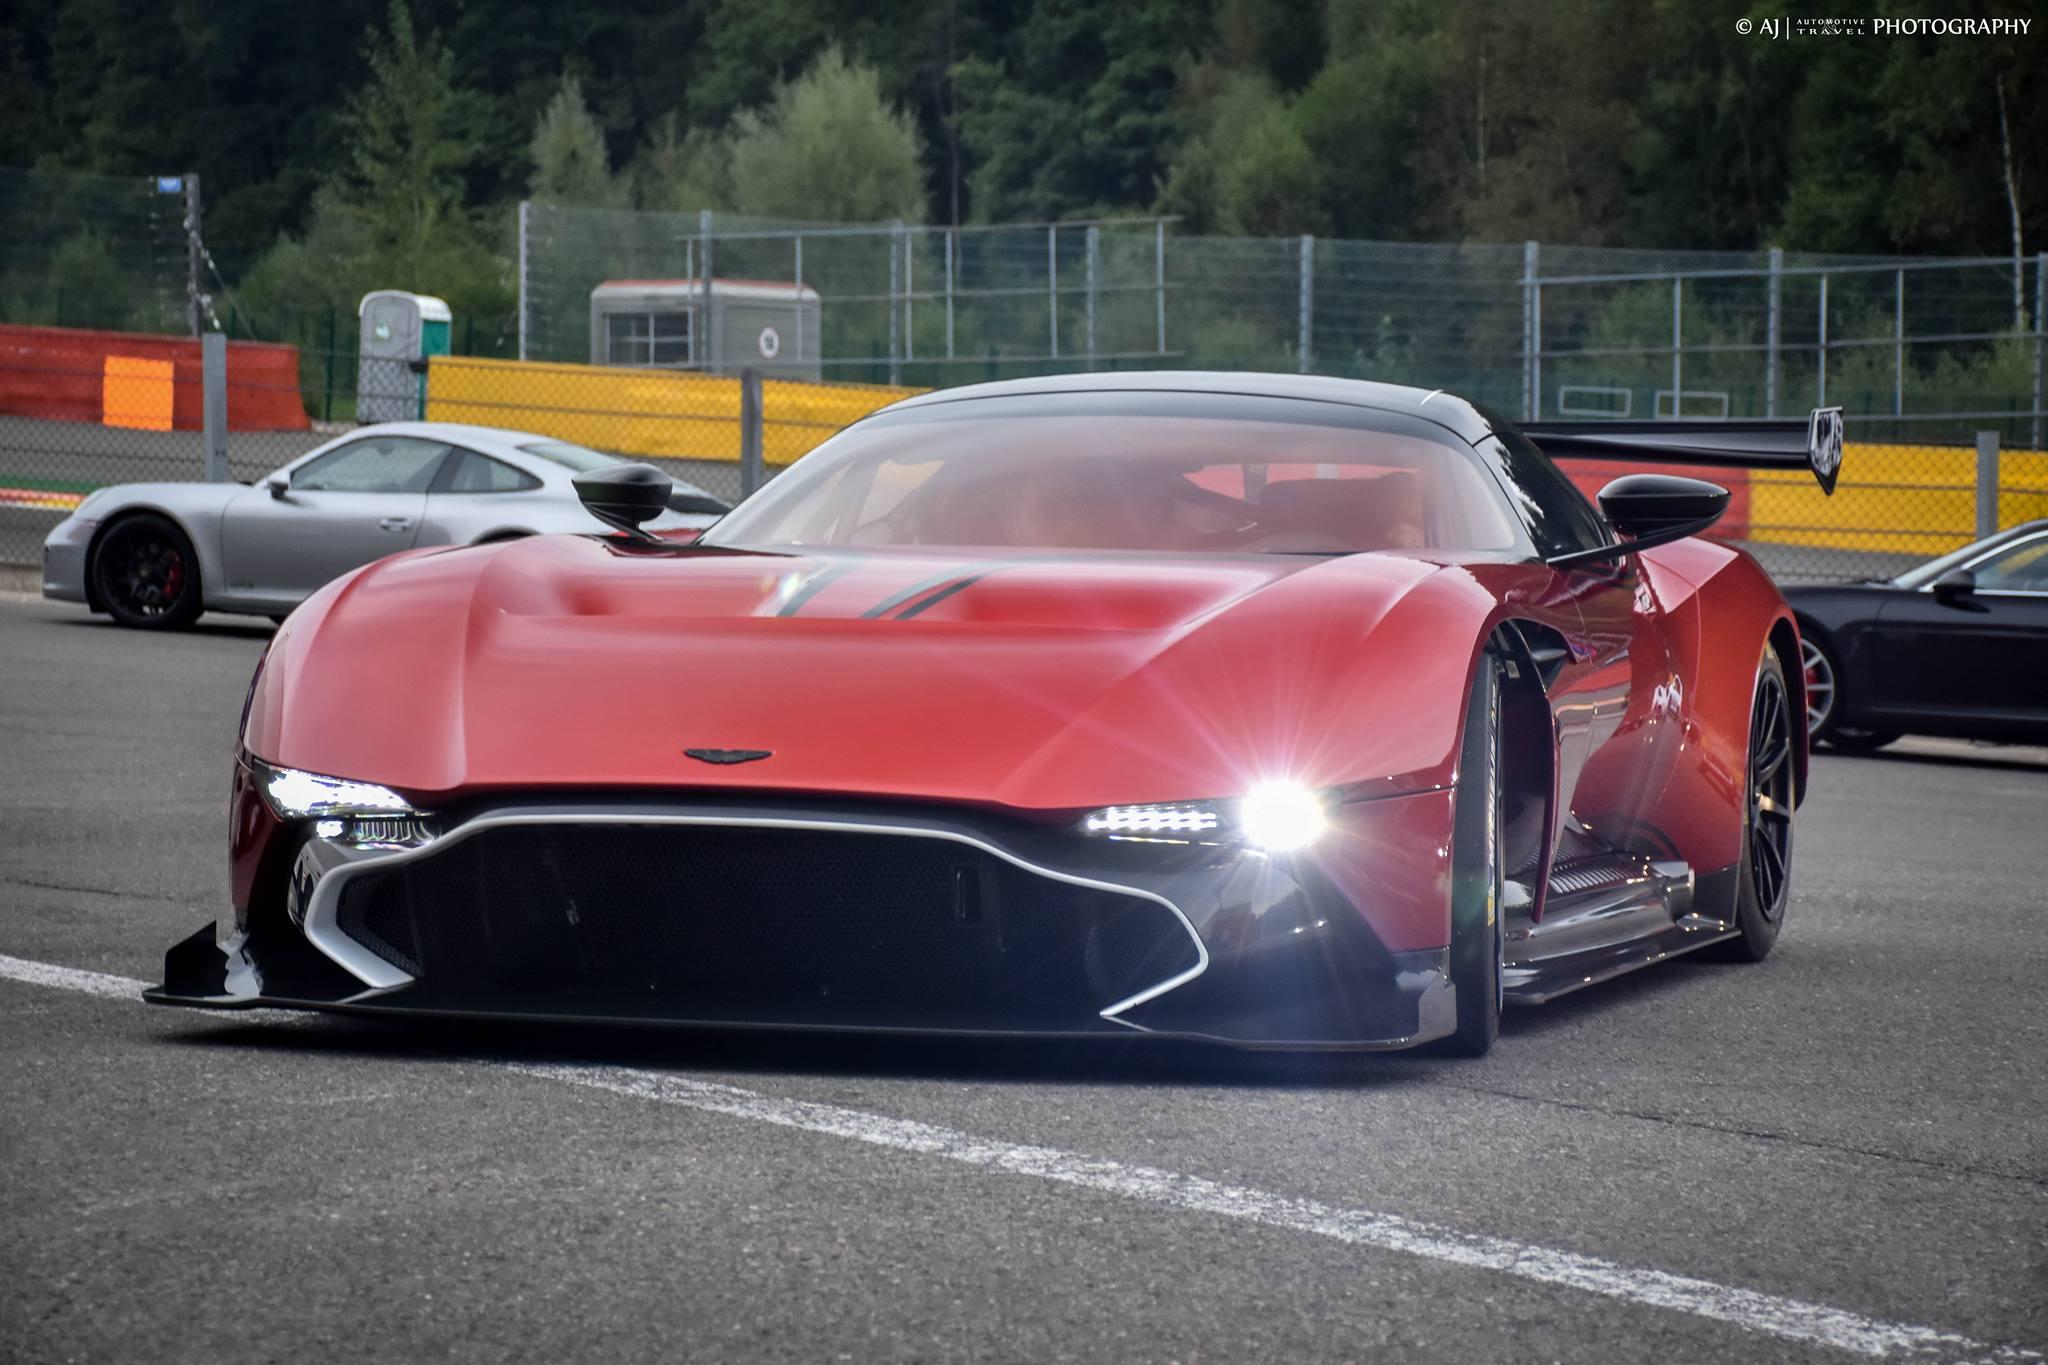 Aston Martin Vulcan Price >> Gallery: Aston Martin Vulcan Attack at Spa-Francorchamps - GTspirit